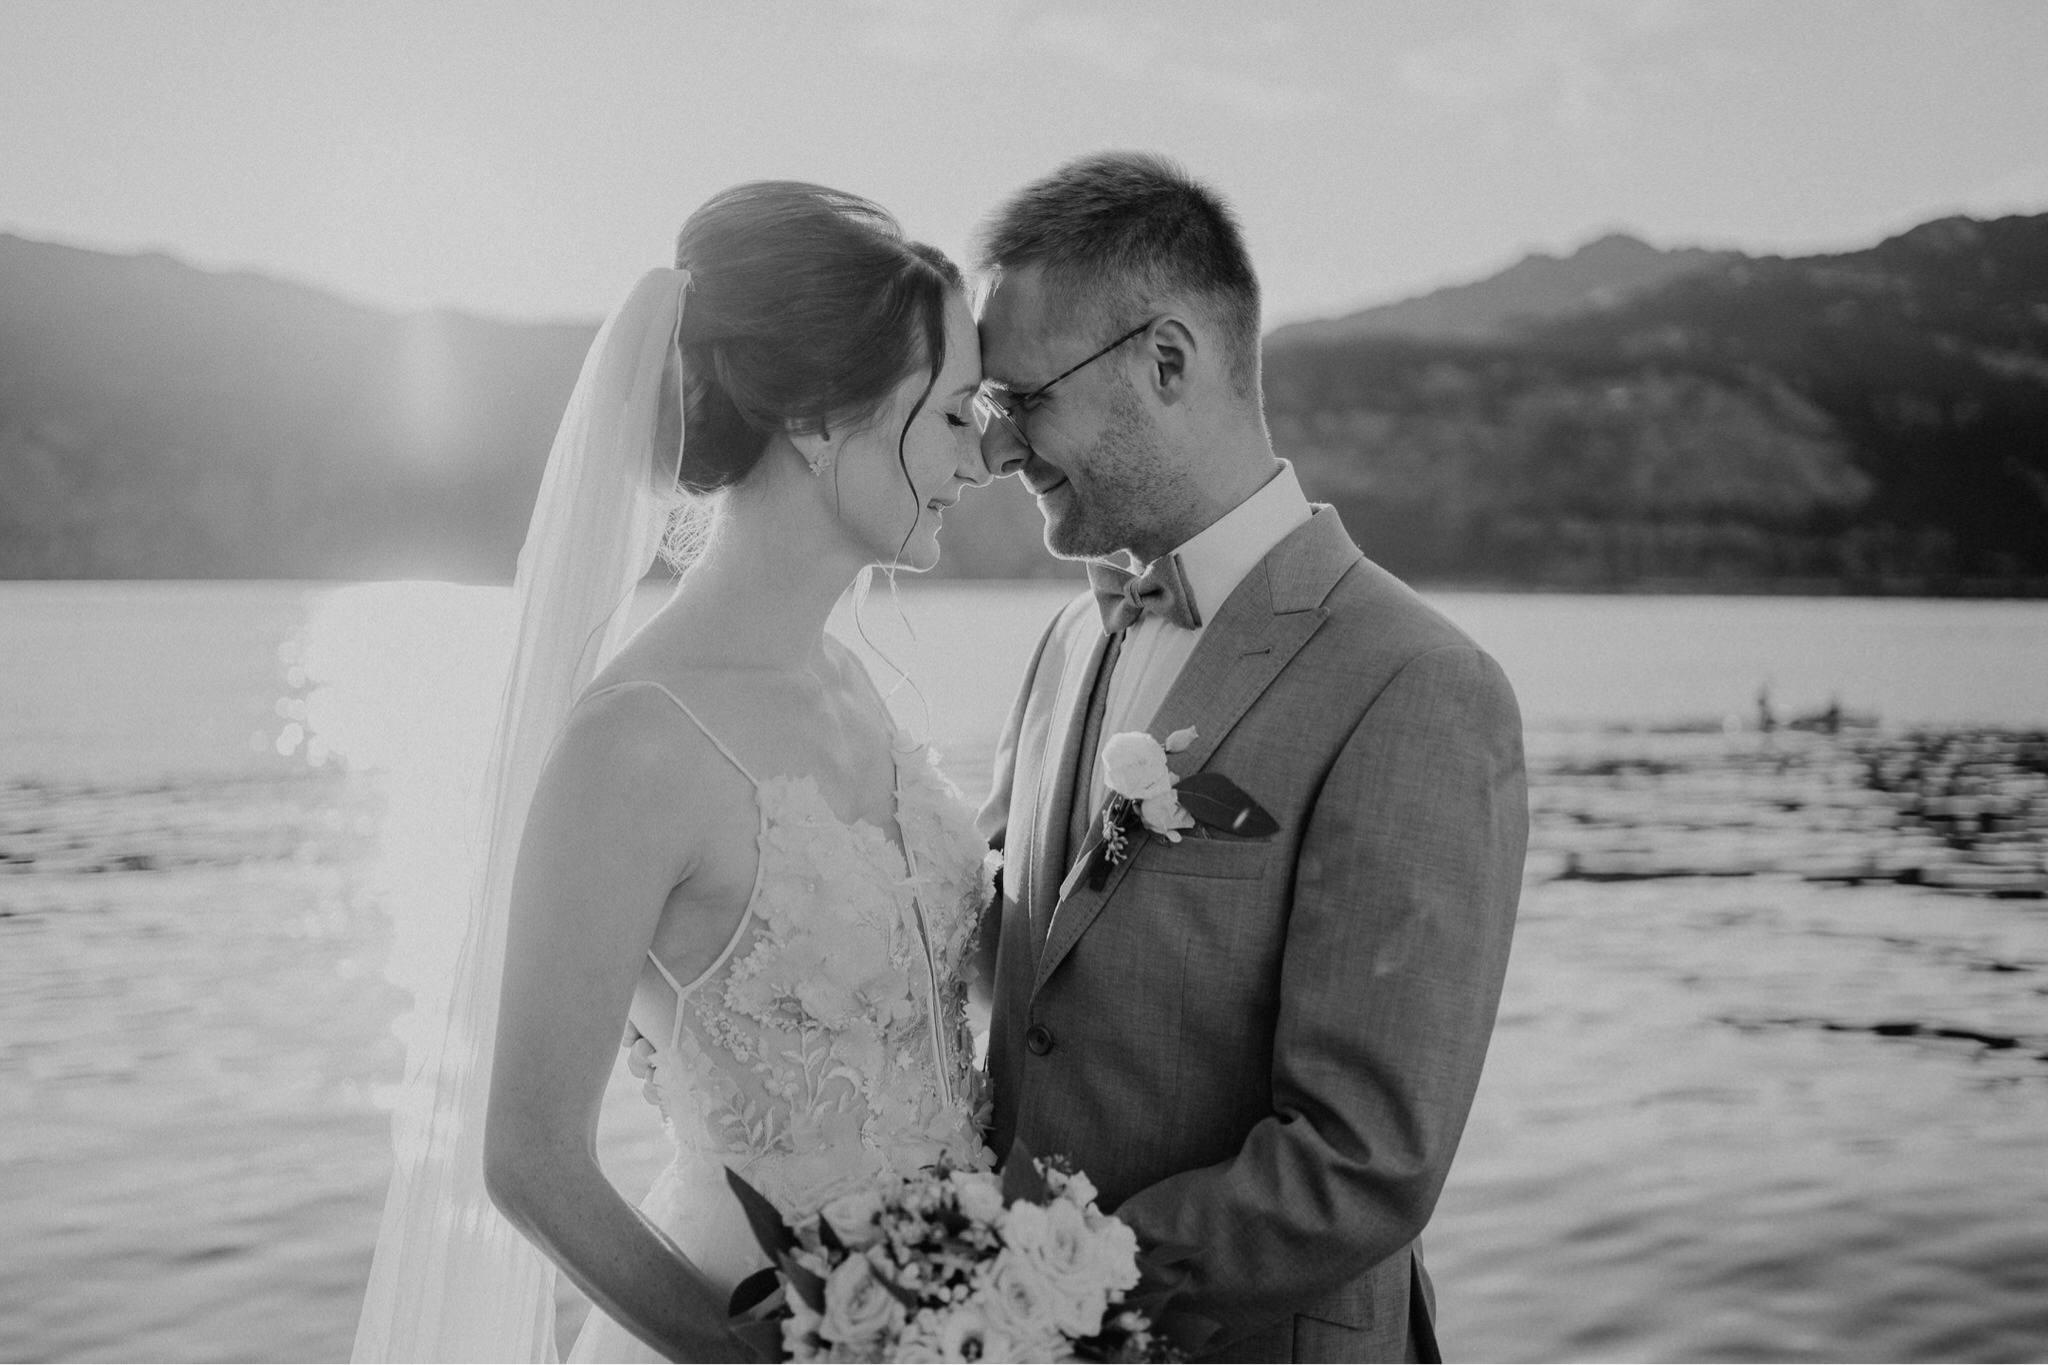 55 la 03 zeremonie 1337 weddinphotographer Hochzeitsfotograf newzealand hamilton Weddingphotography Stuttgart